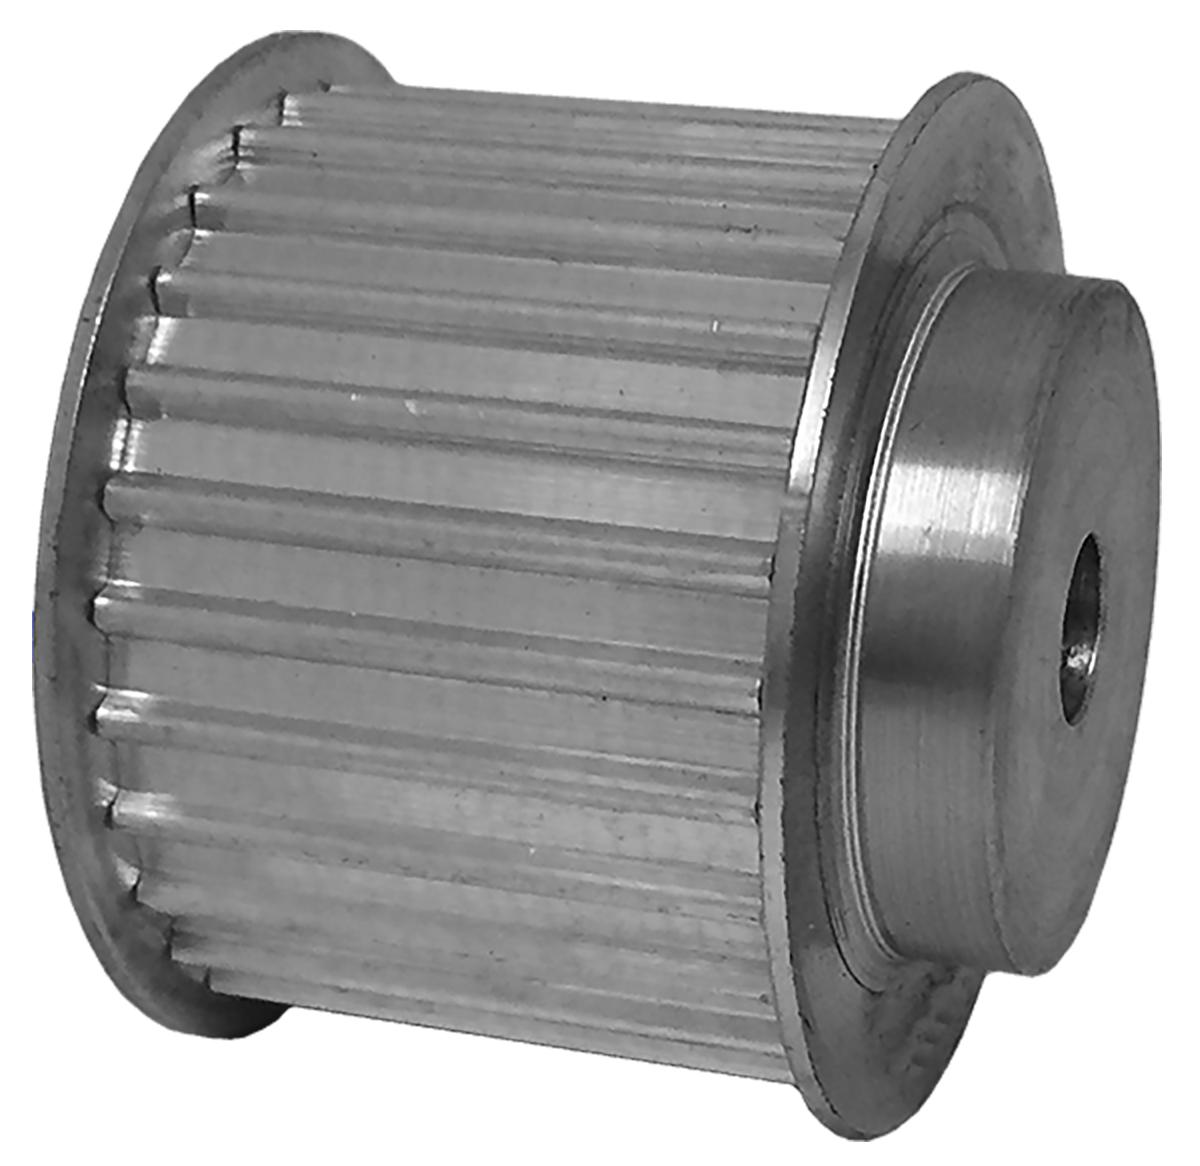 38AT5/27-2 - Aluminum Metric Pulleys